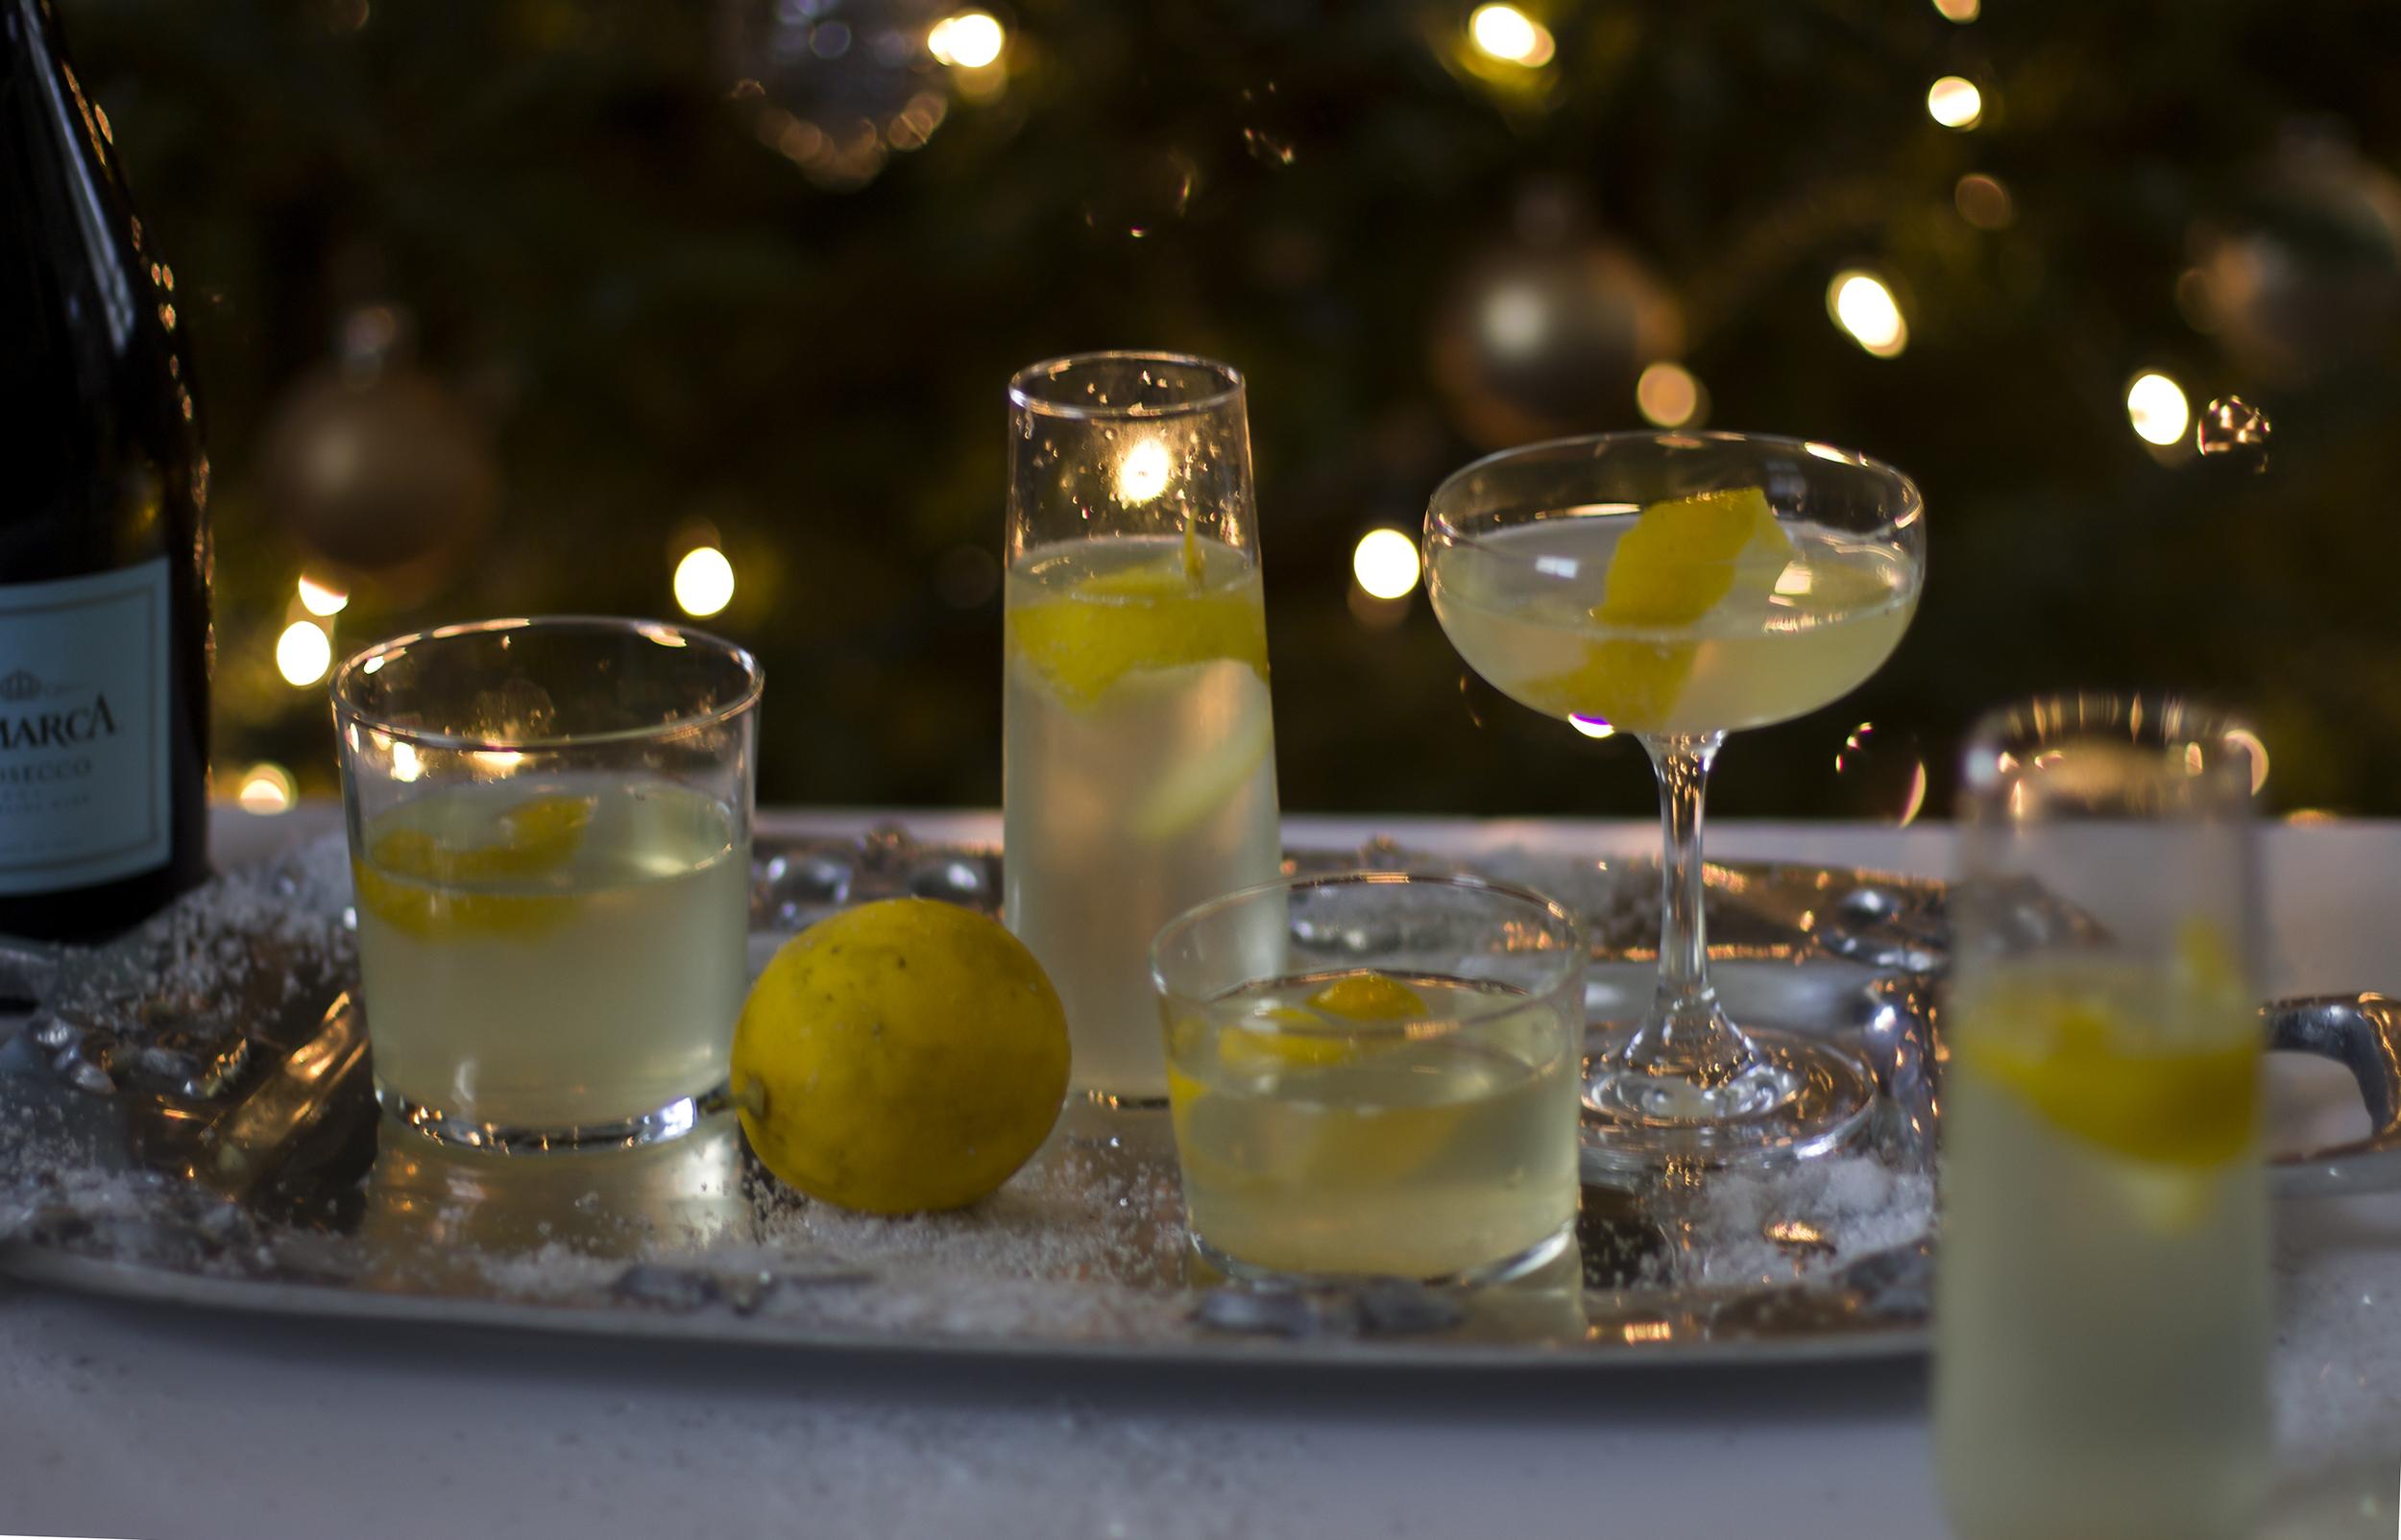 Lemon Ginger Twist: My Diary of Us